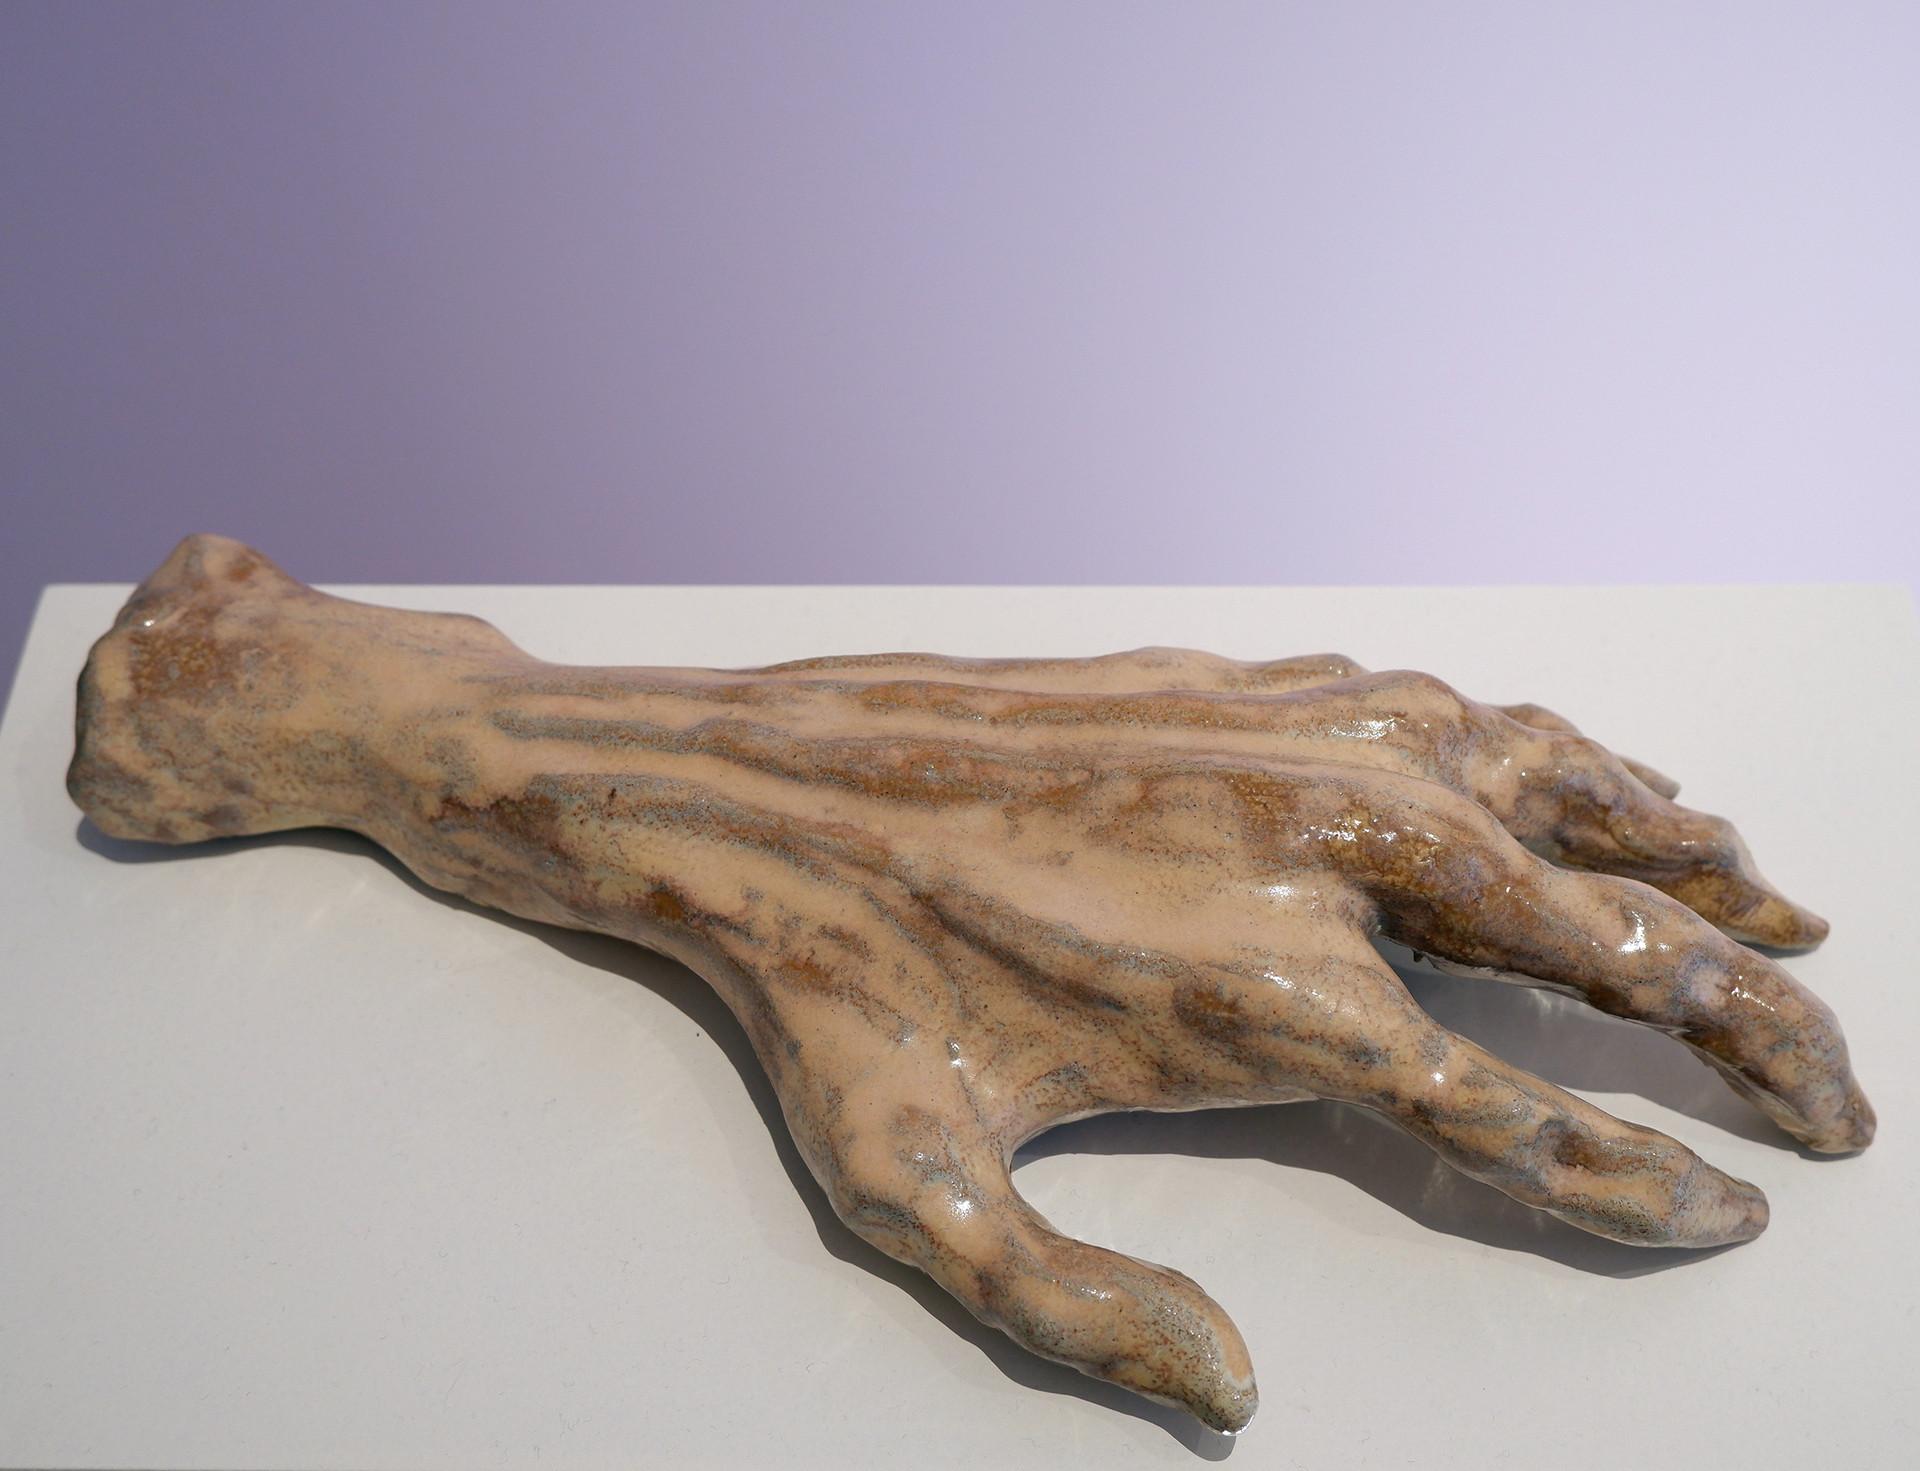 Klara Lilja Hand of Glory - Rutil, 2019 White clay, glaze (stoneware) 35 x 14 x 8 cm